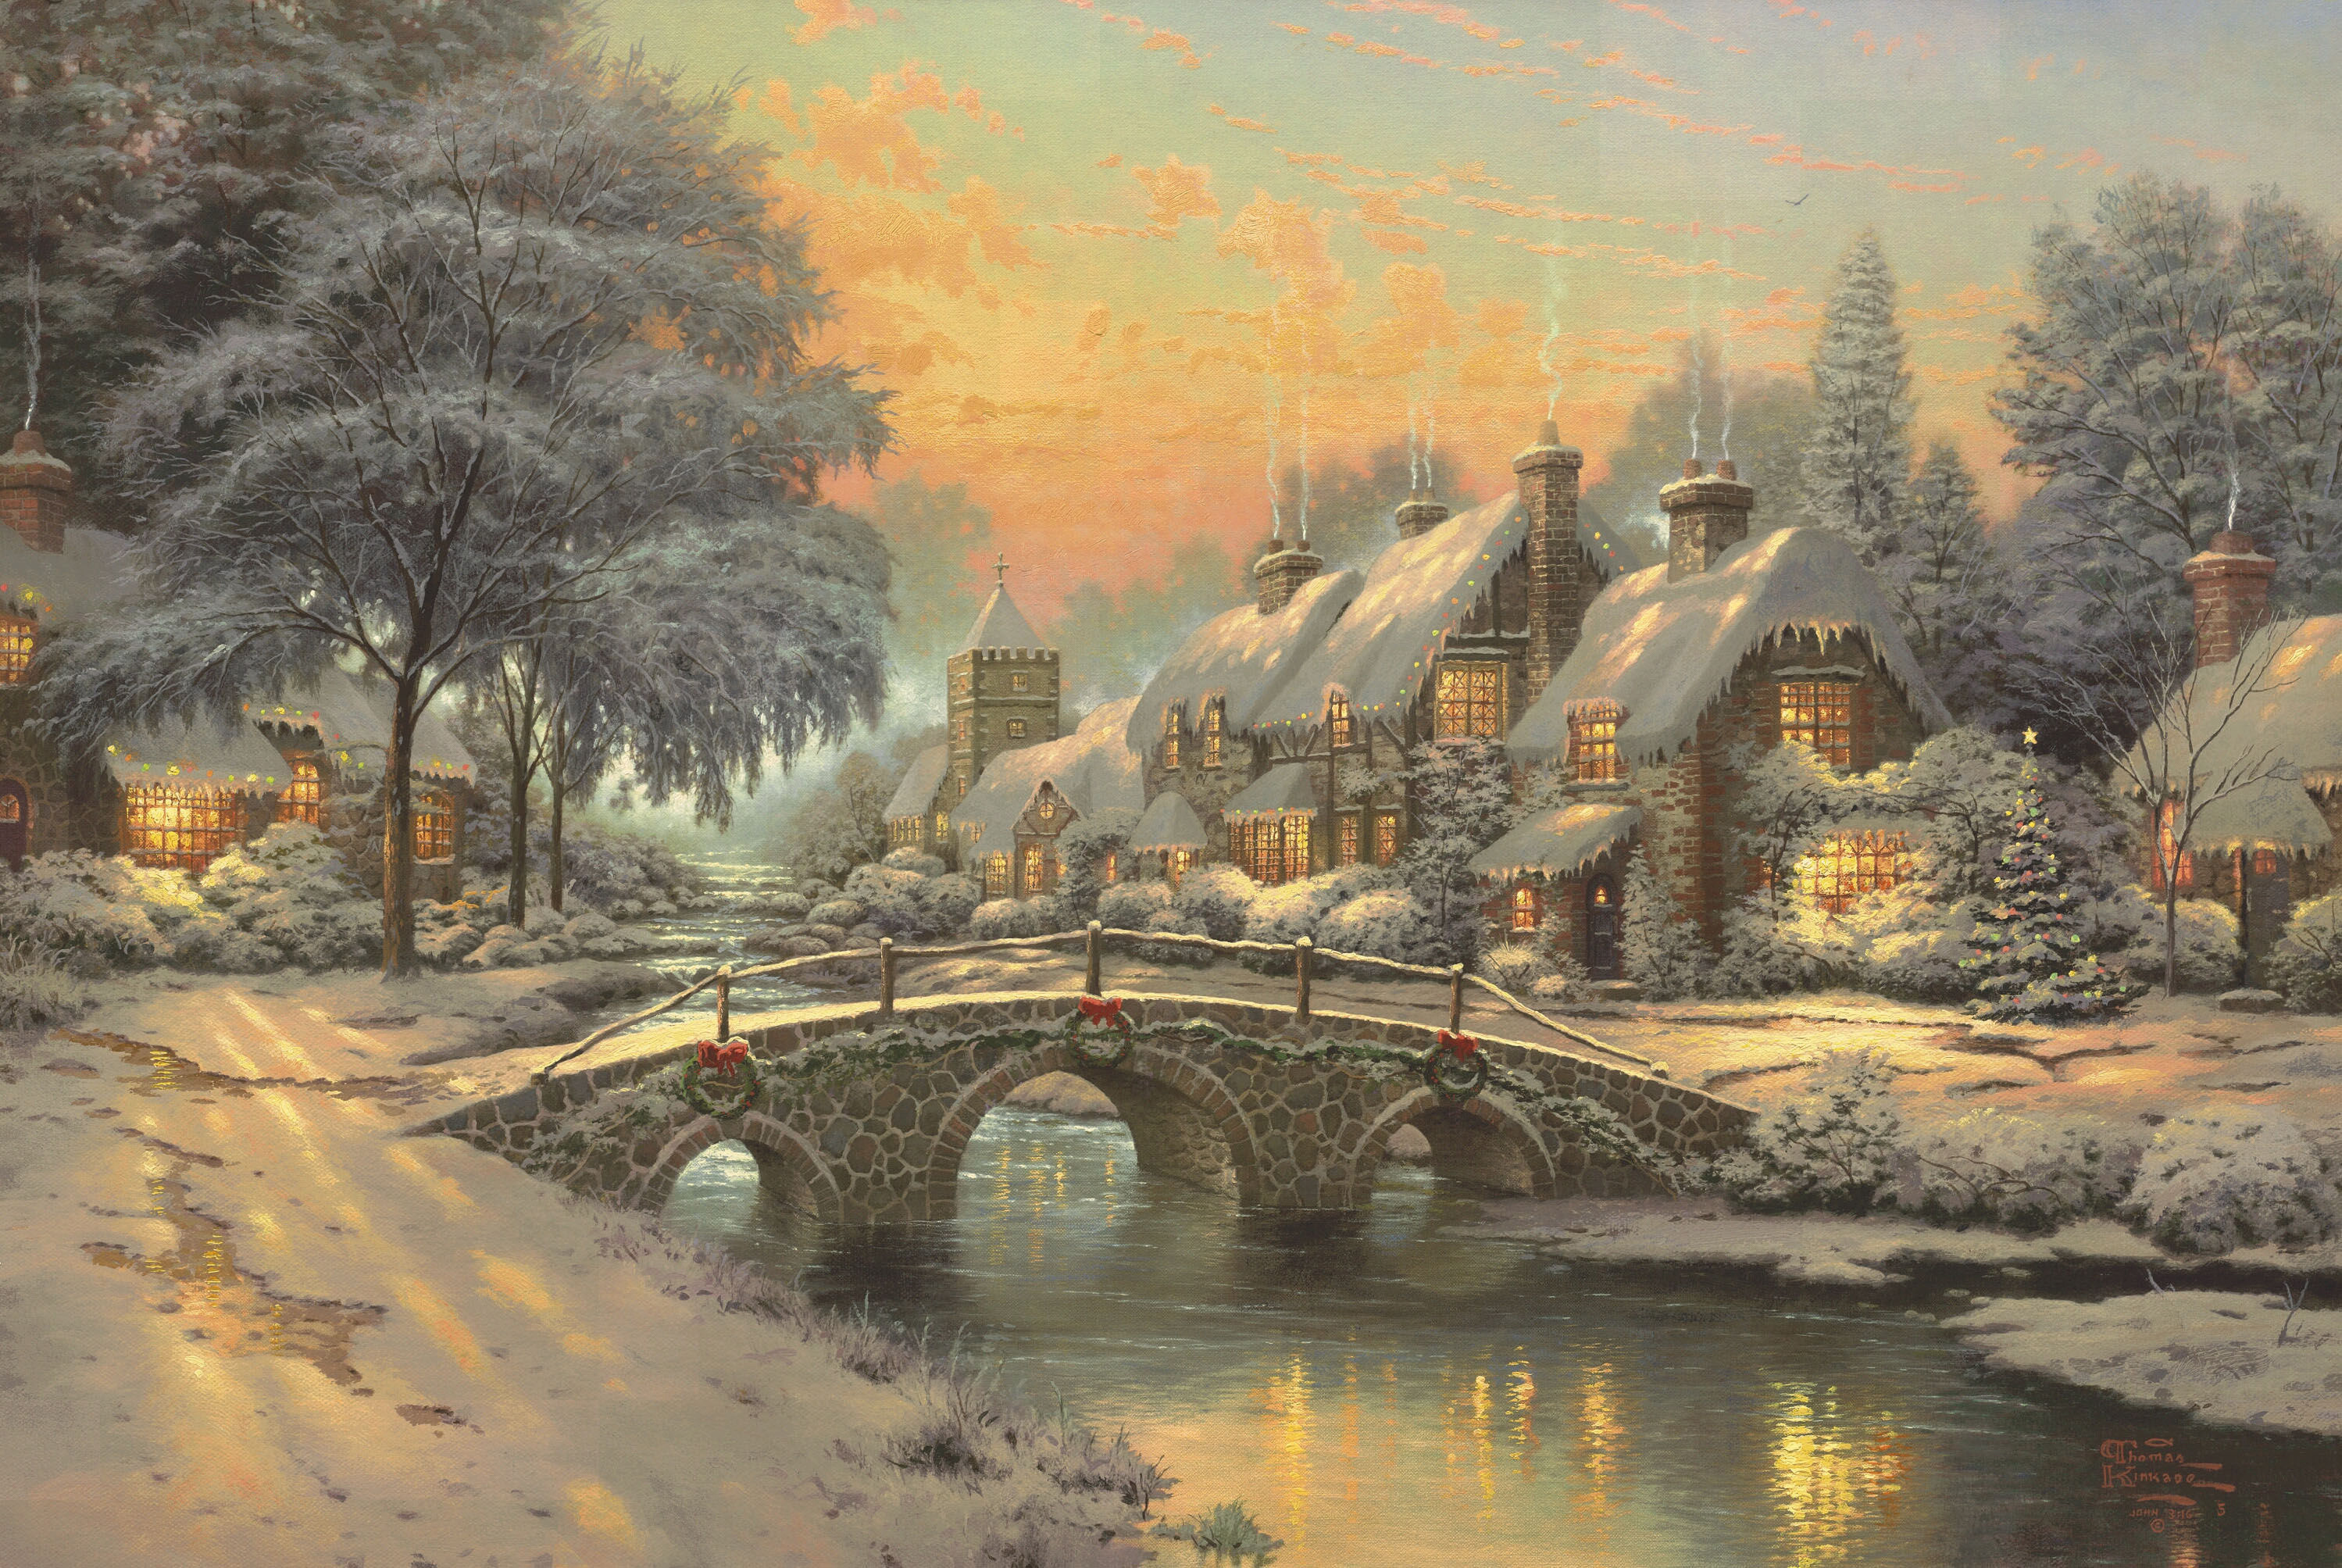 <p>Рождество в деревне</p>